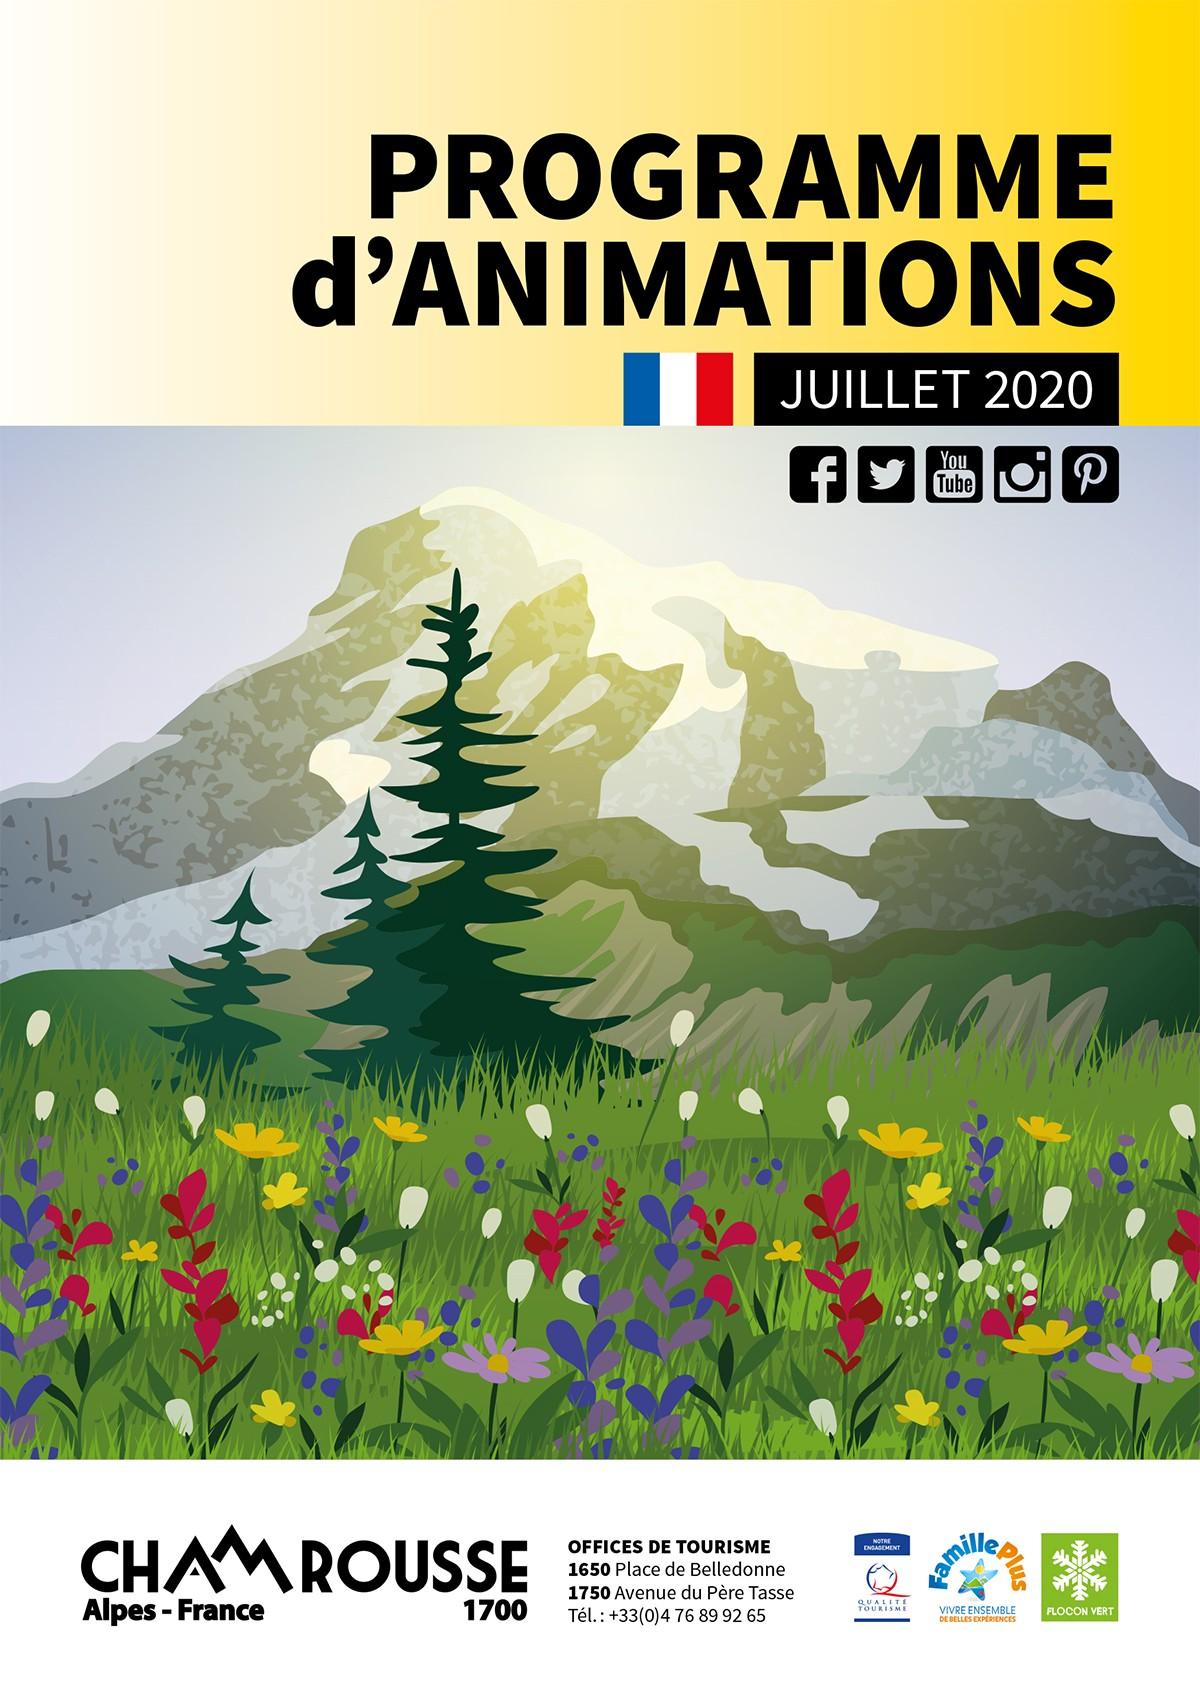 Chamrousse programme animations juillet 2020 station montagne isère alpes france